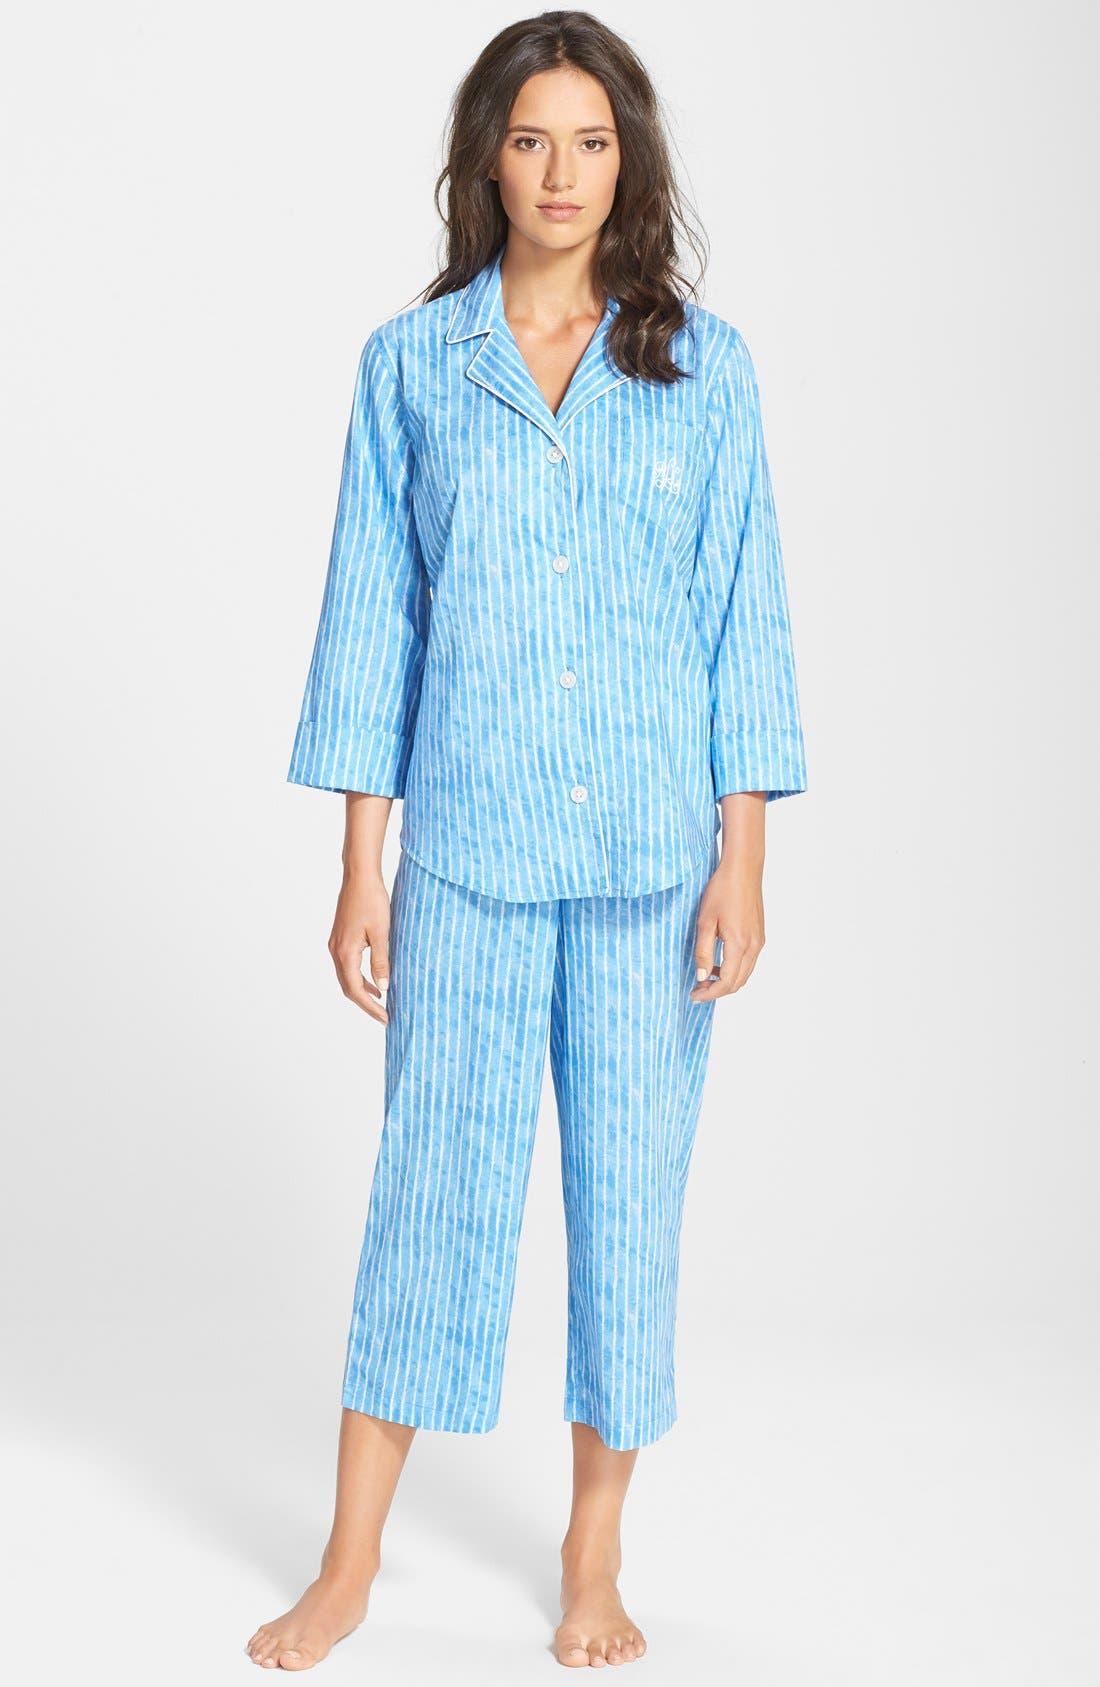 Main Image - Lauren Ralph Lauren Notch Collar Capri Pajamas